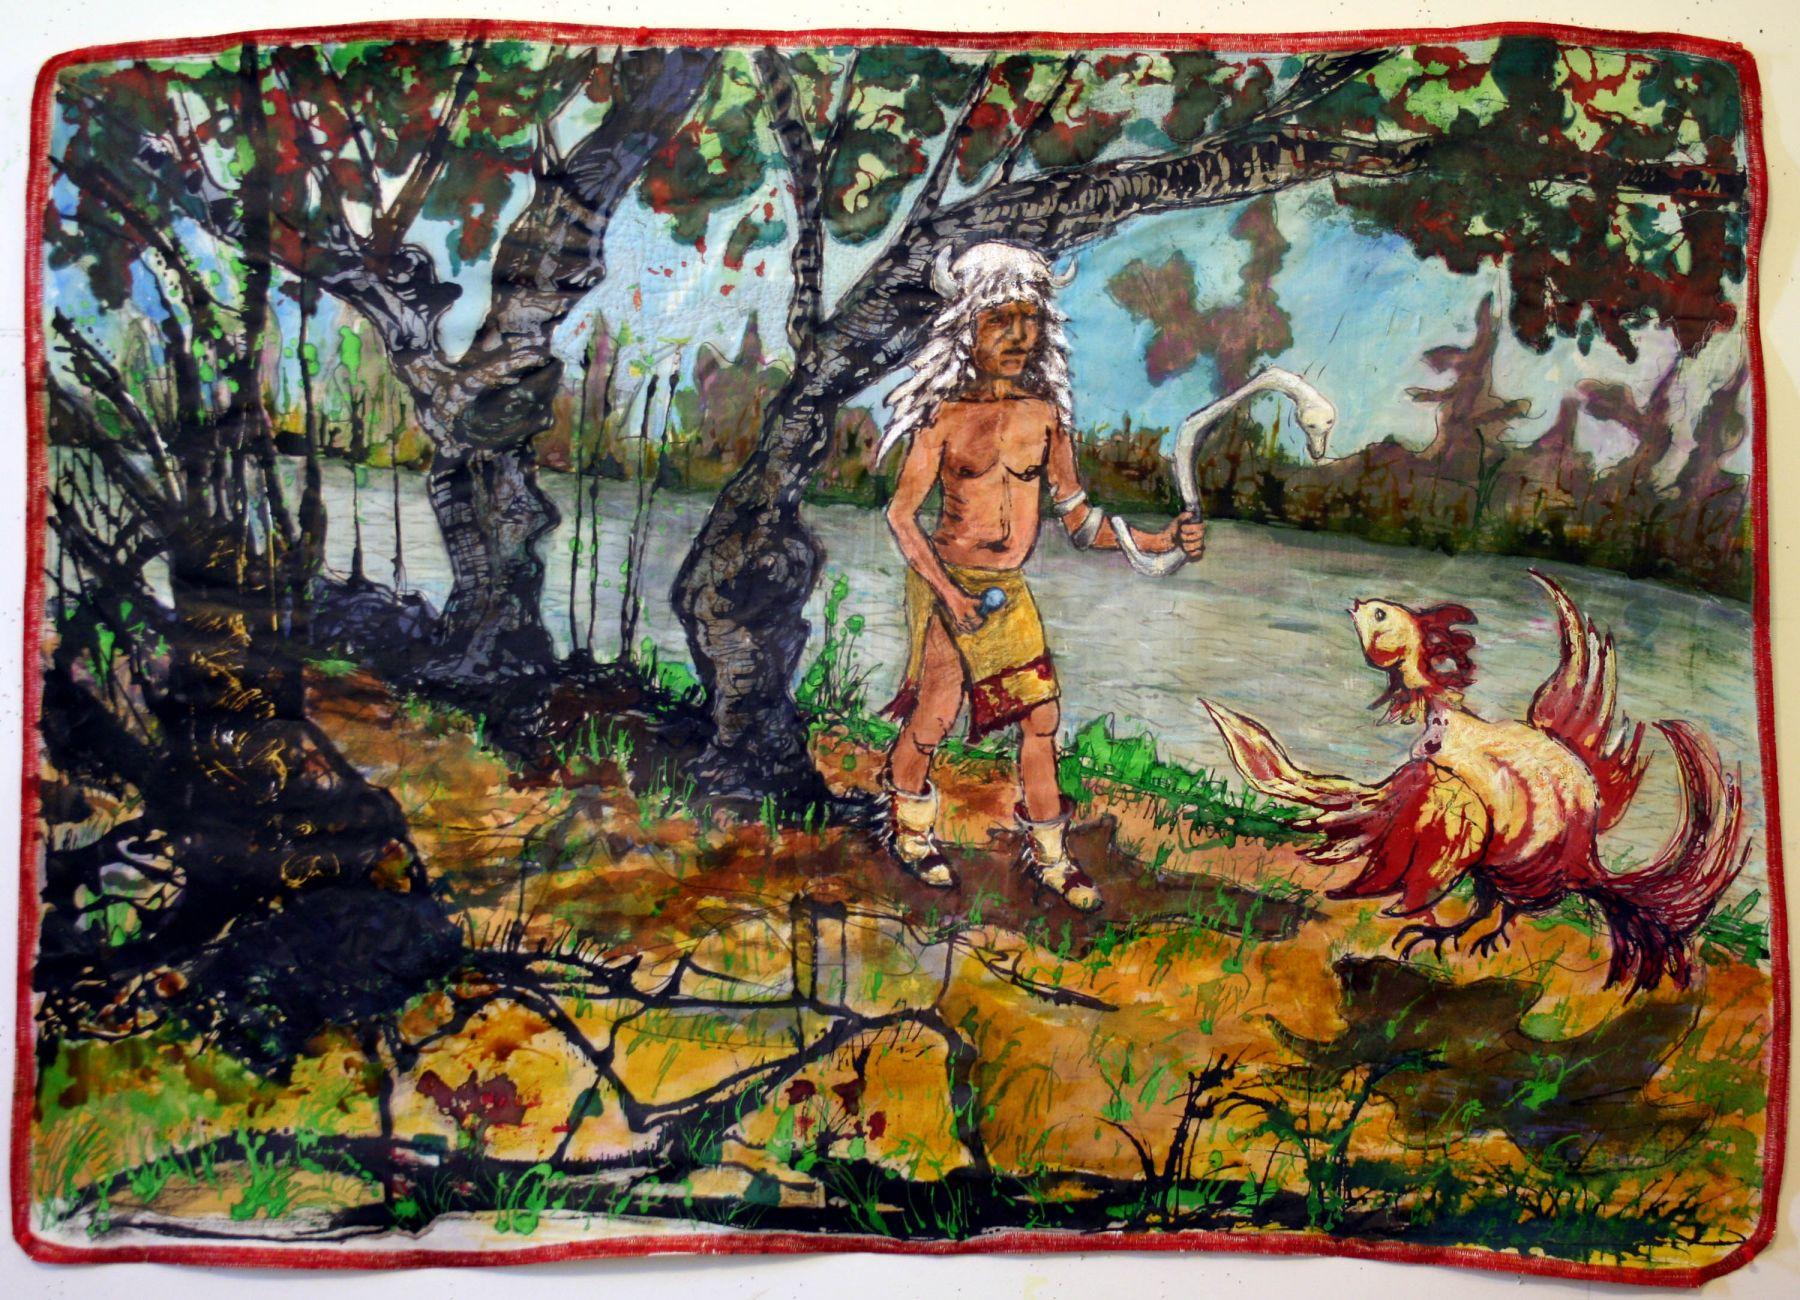 GINA PHILLIPS Mardi Gras Indian Myth #1, 2010